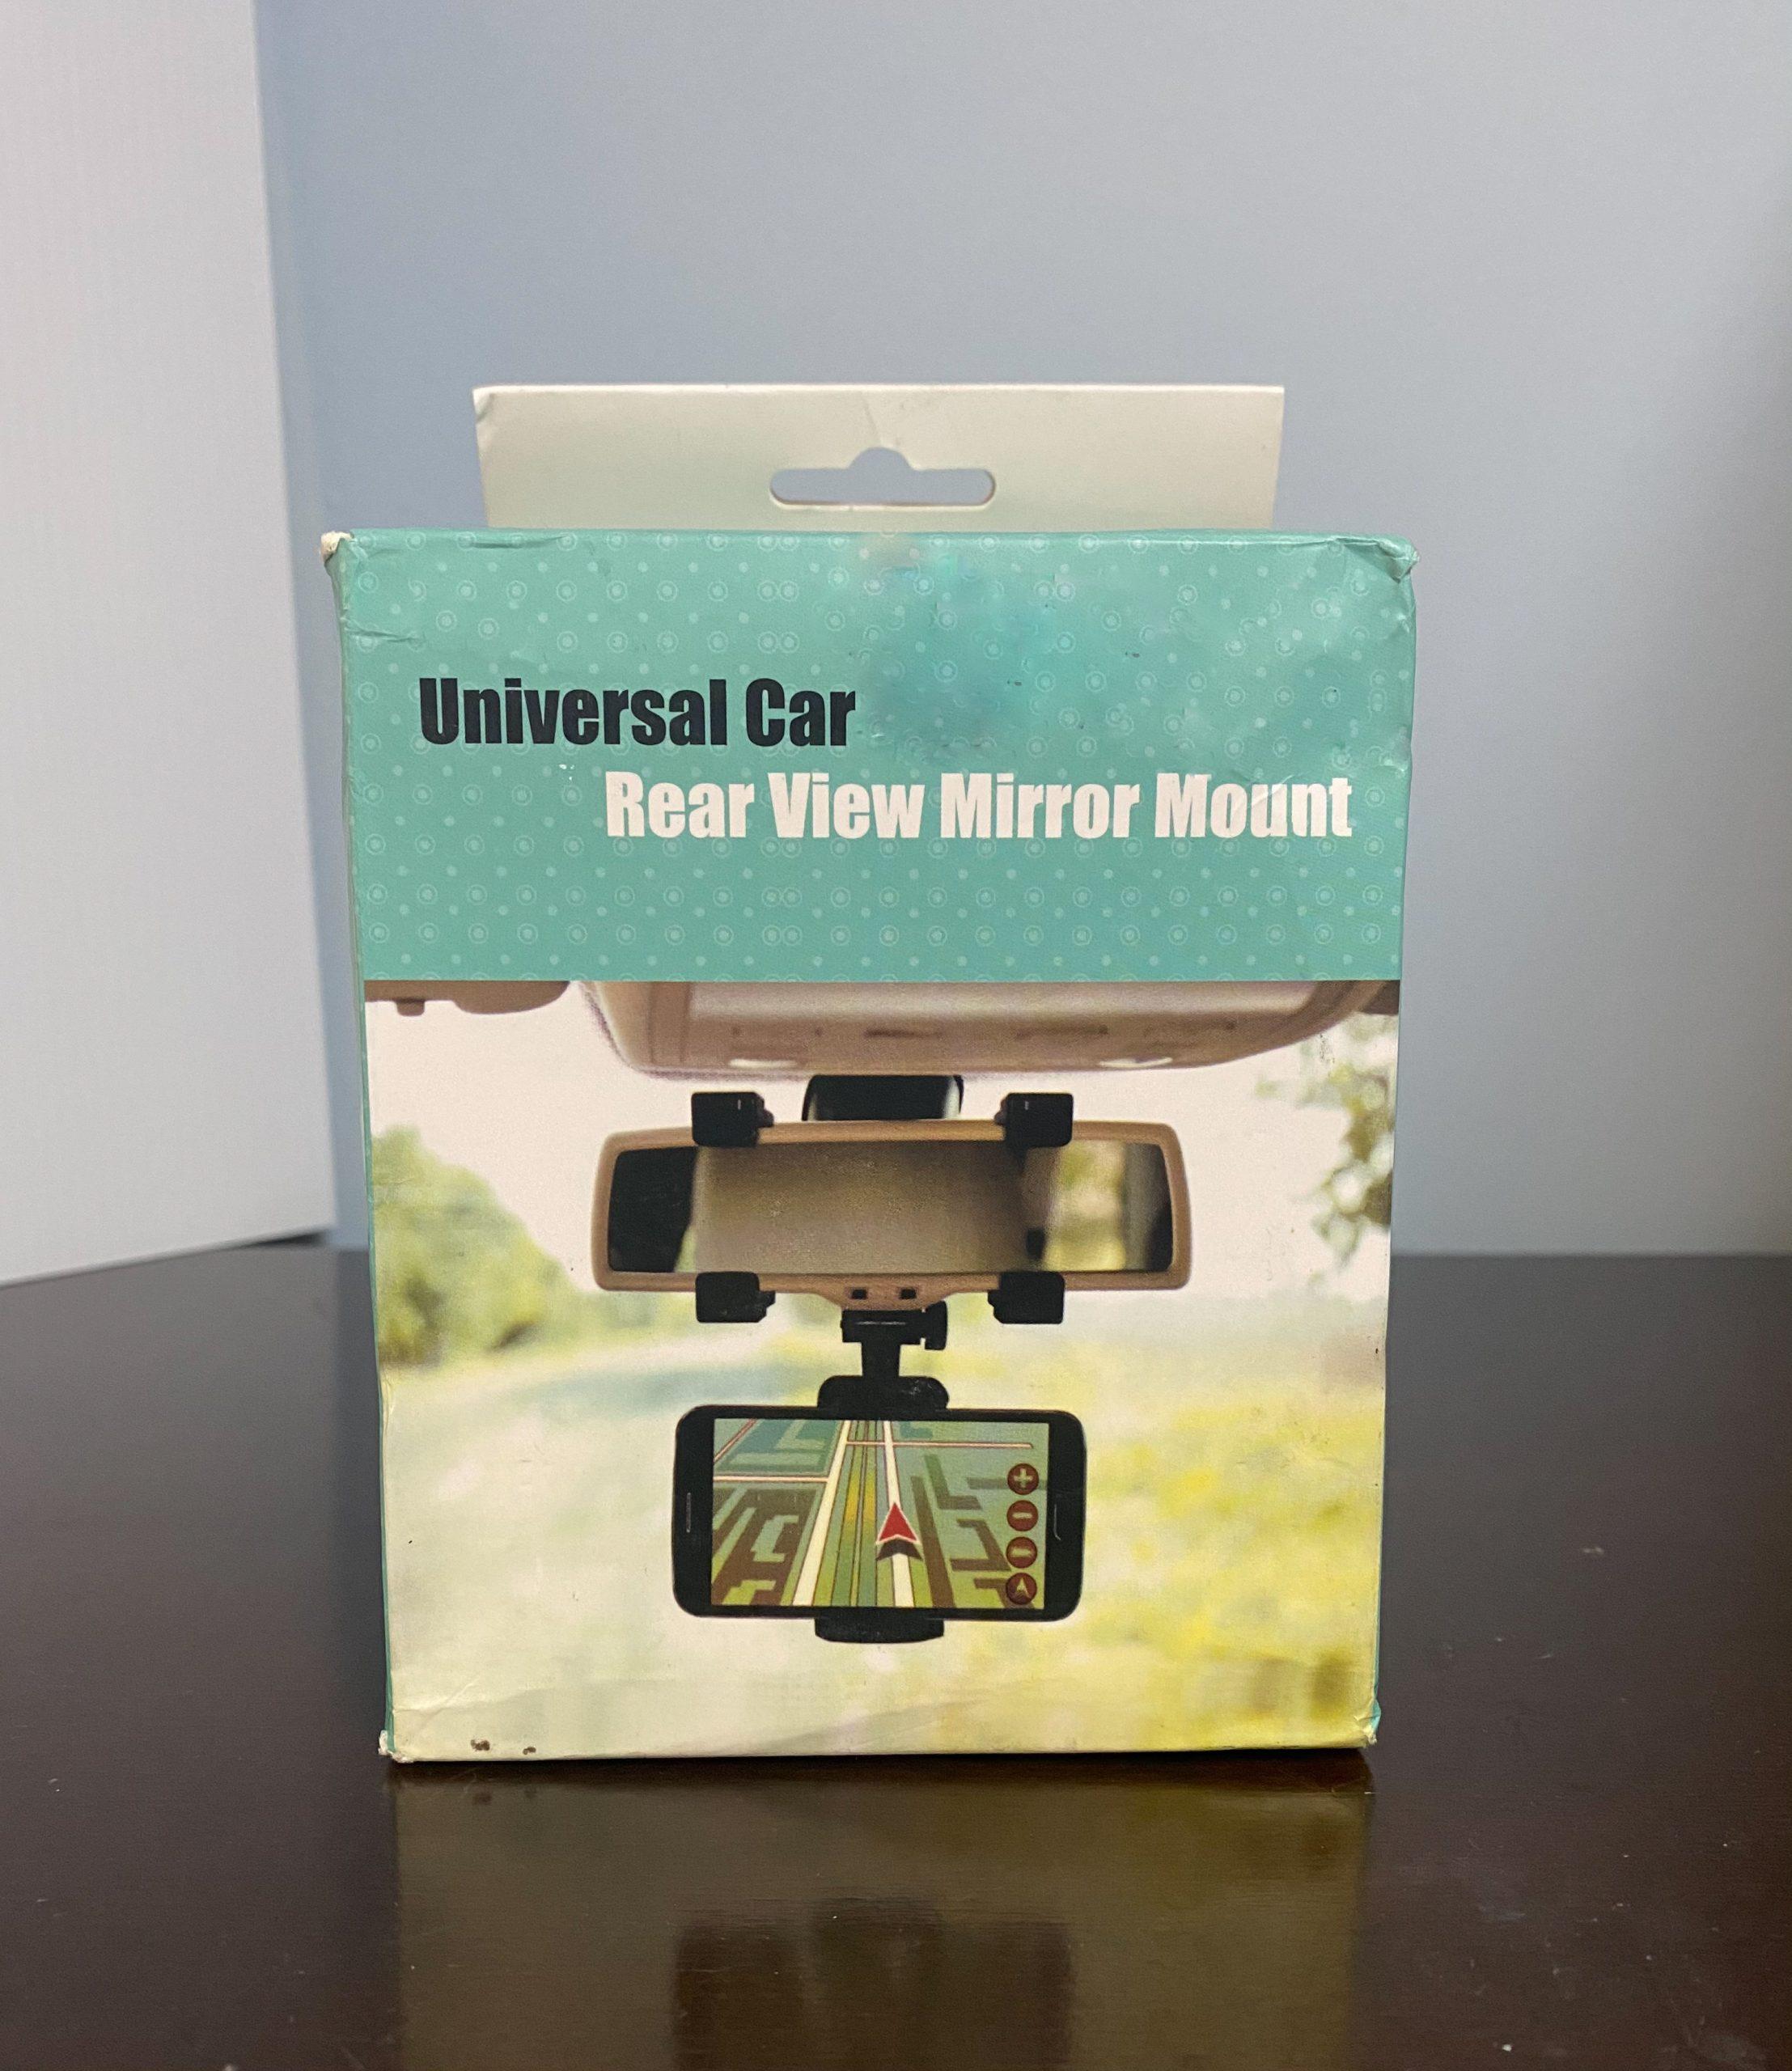 Universal Rear view mirror mount